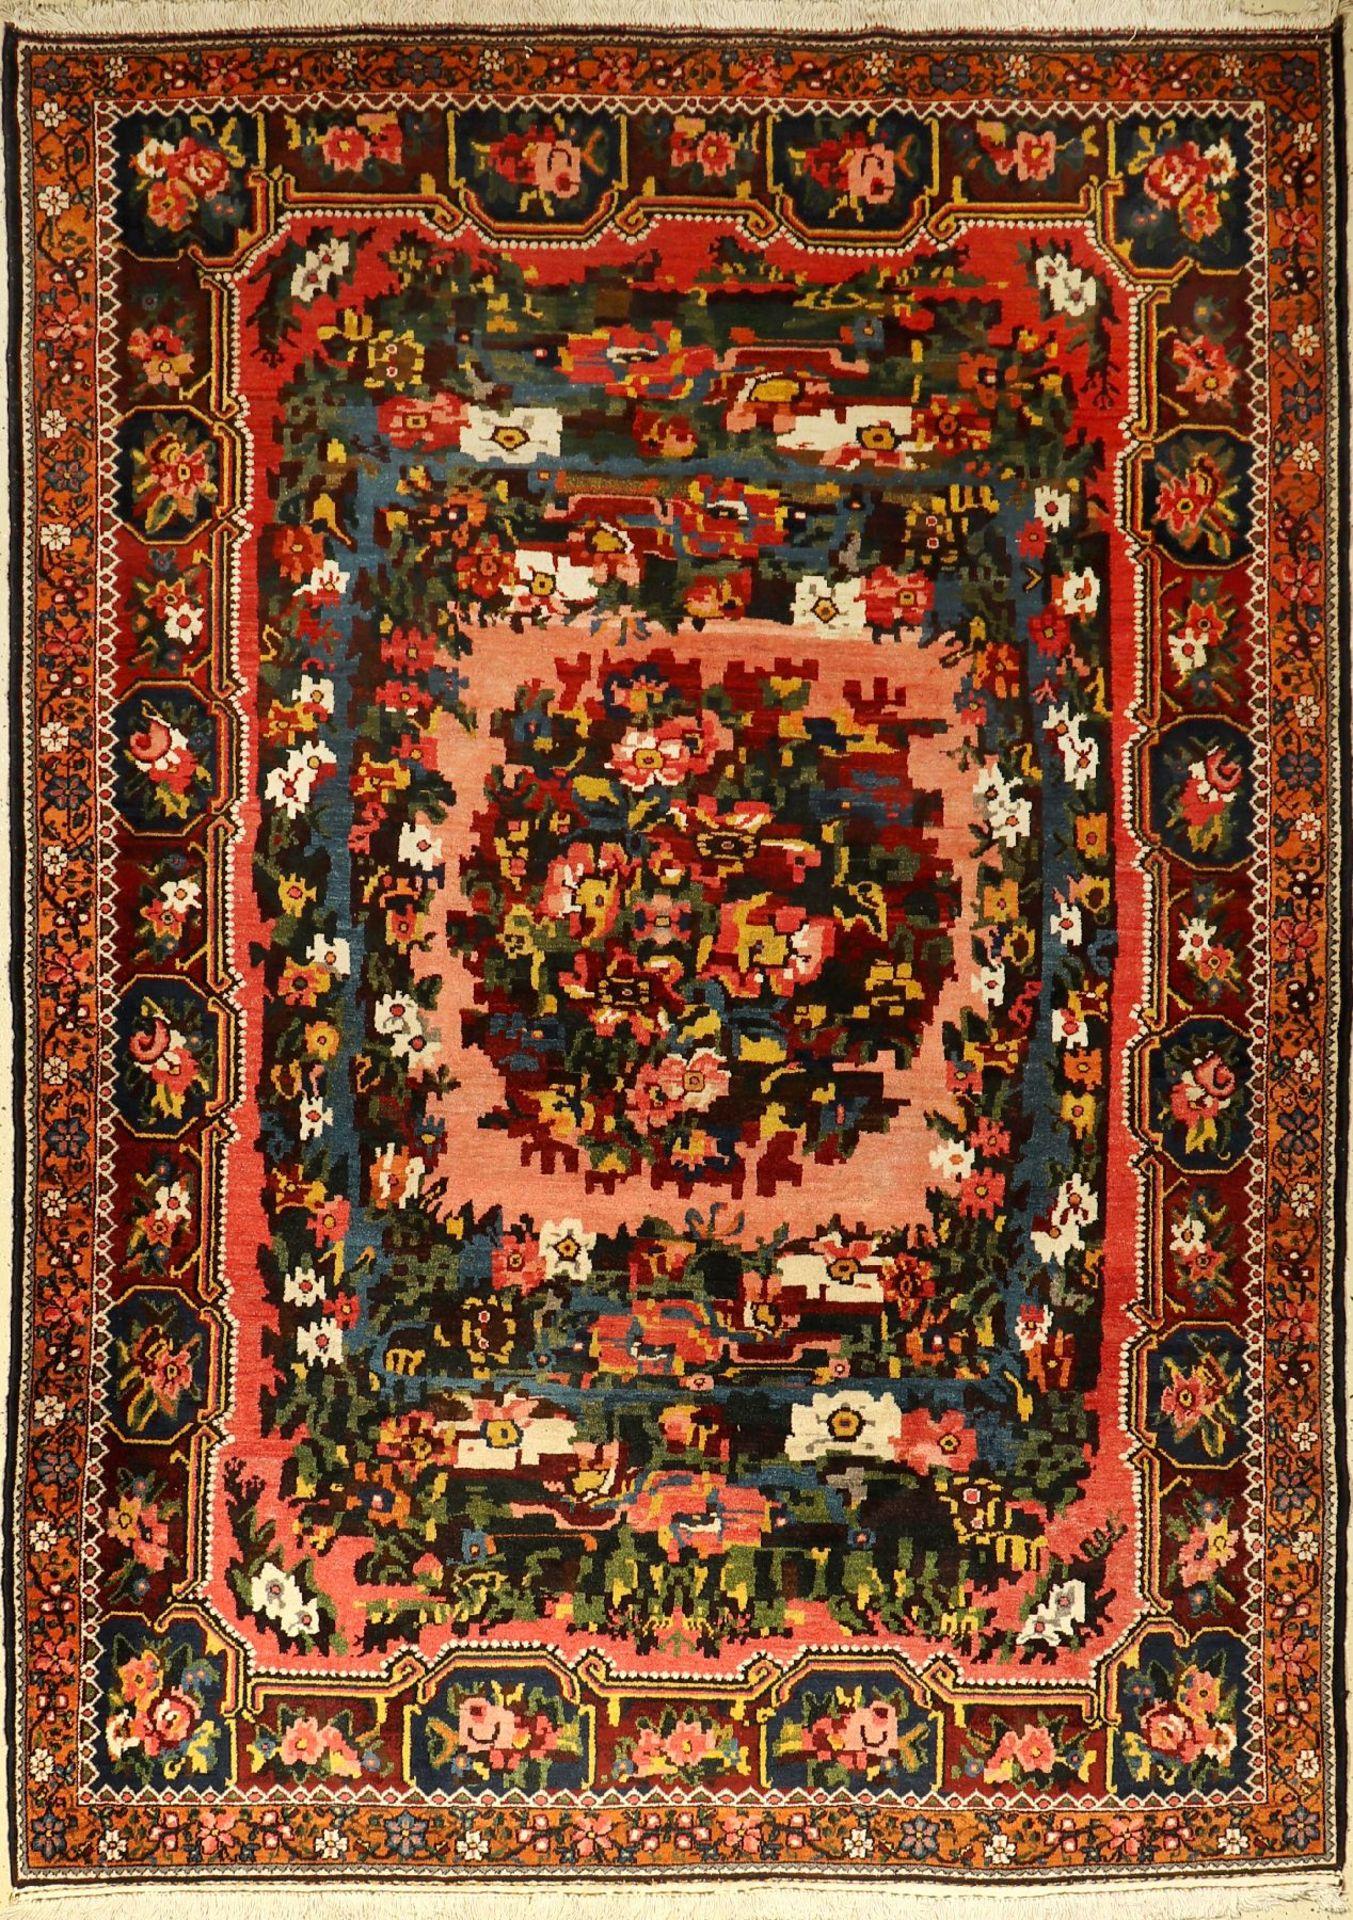 Bachtiar alt (Golfarang), Persien, um 1940,Wolle auf Baumwolle, ca. 310 x 212 cm, EHZ: 2,Guter Flor,